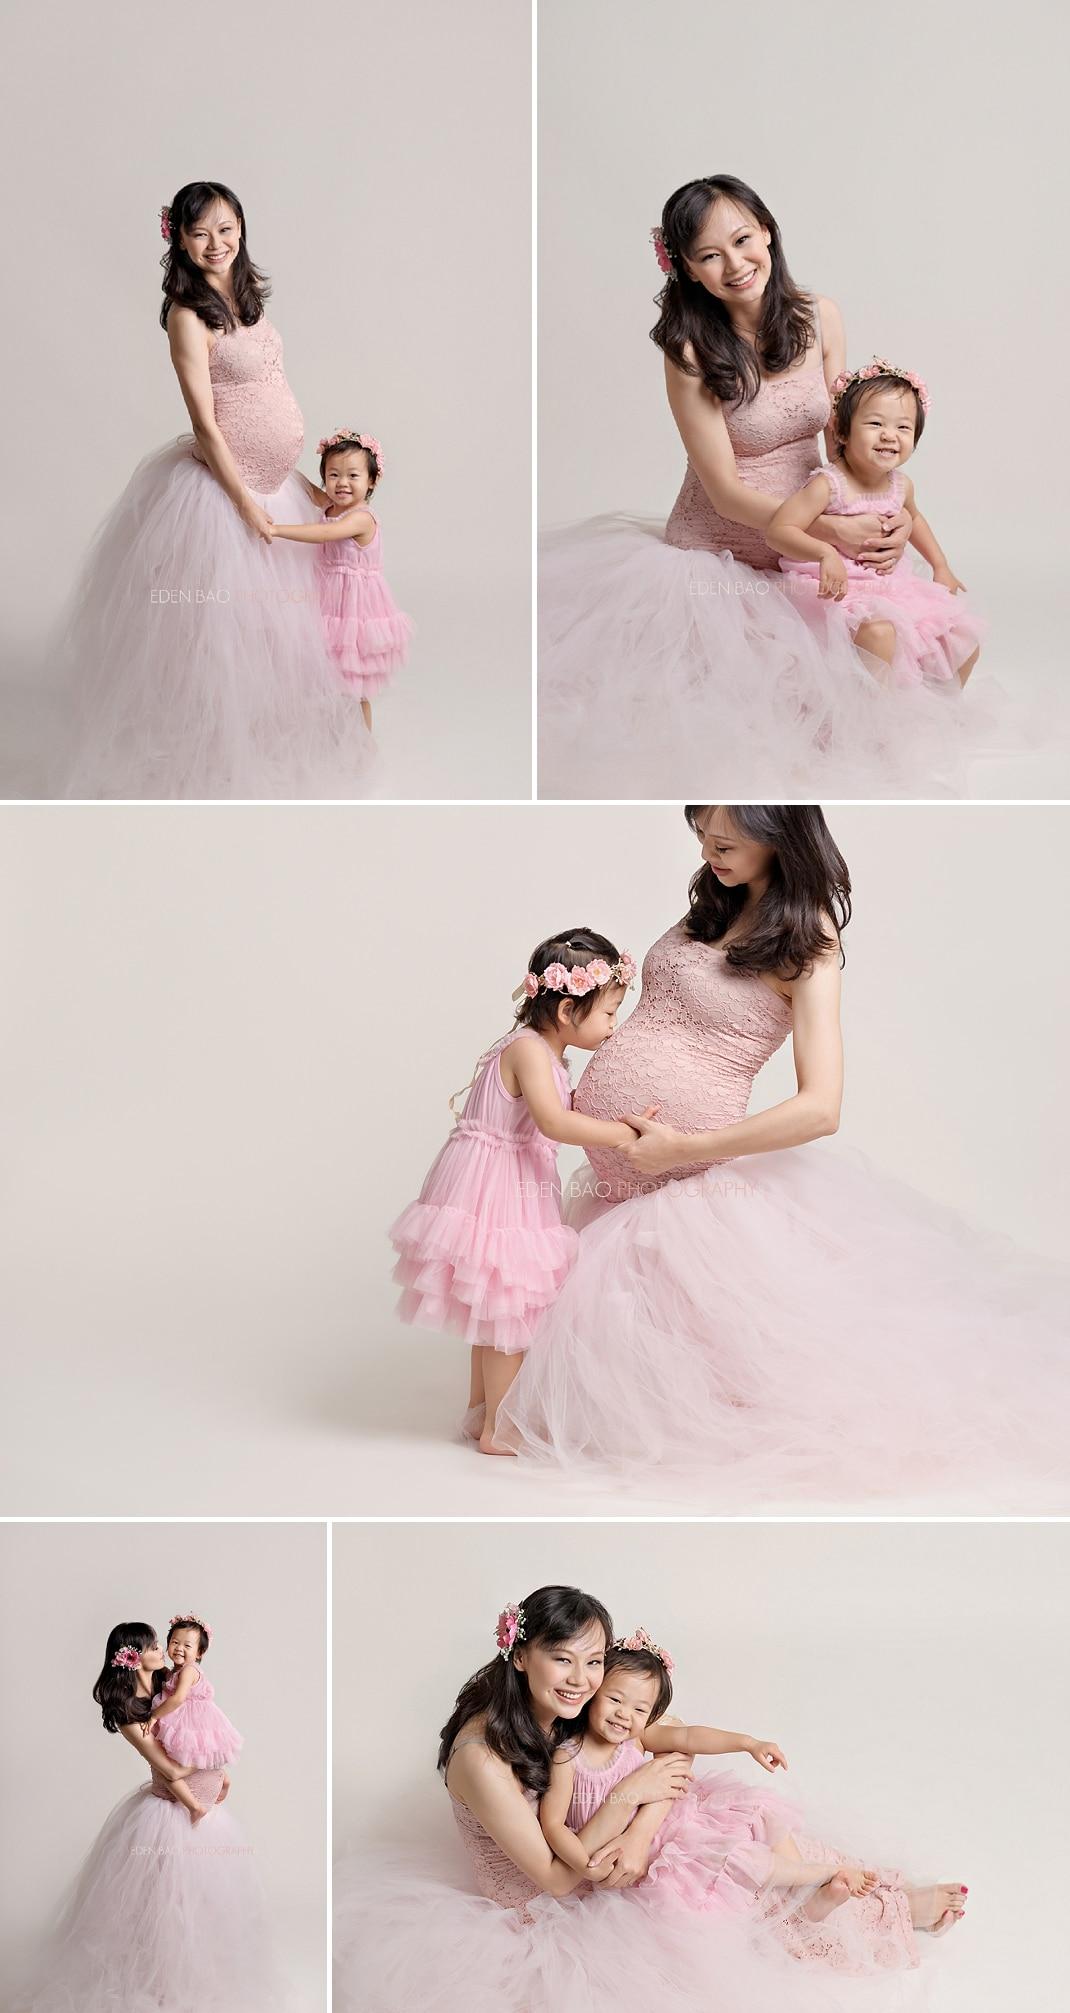 Seattle Maternity Photographer dusty pink tutu